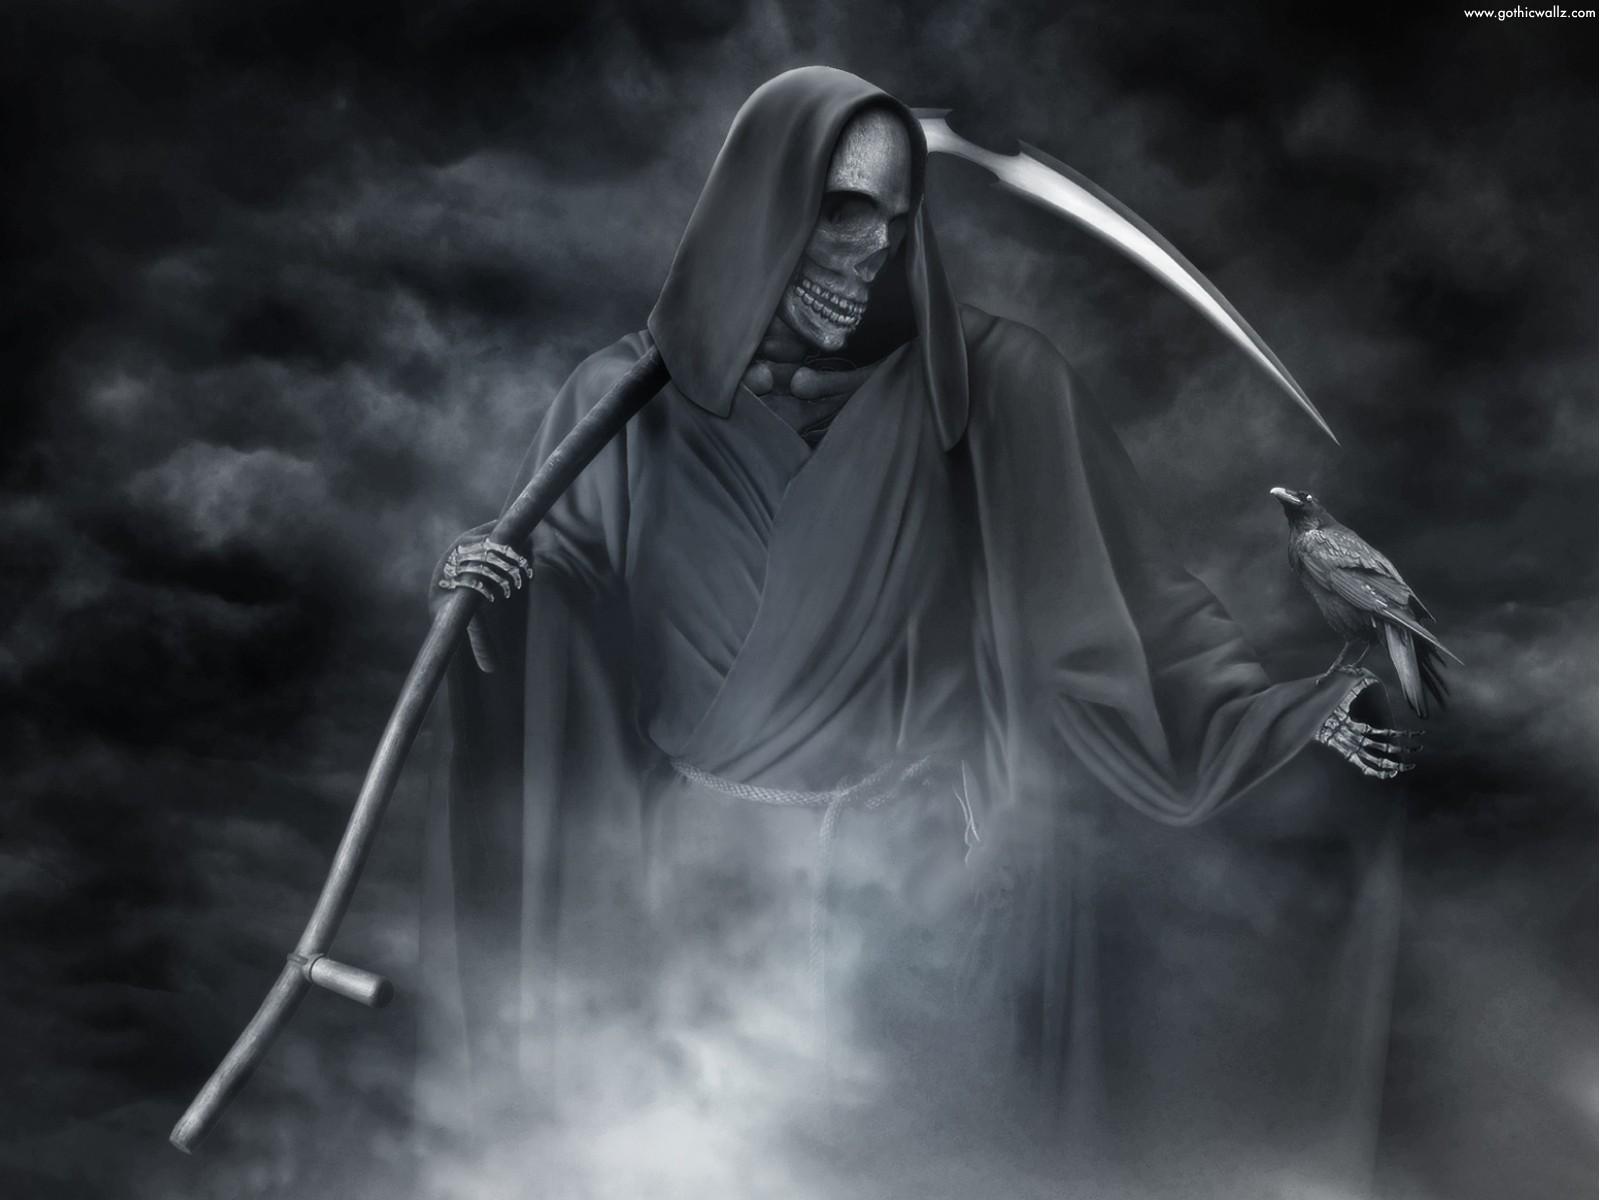 Http - //2 - Bp - Blogspot - Com/ Reaper With Crow%2b%2528www - Grim Reaper , HD Wallpaper & Backgrounds